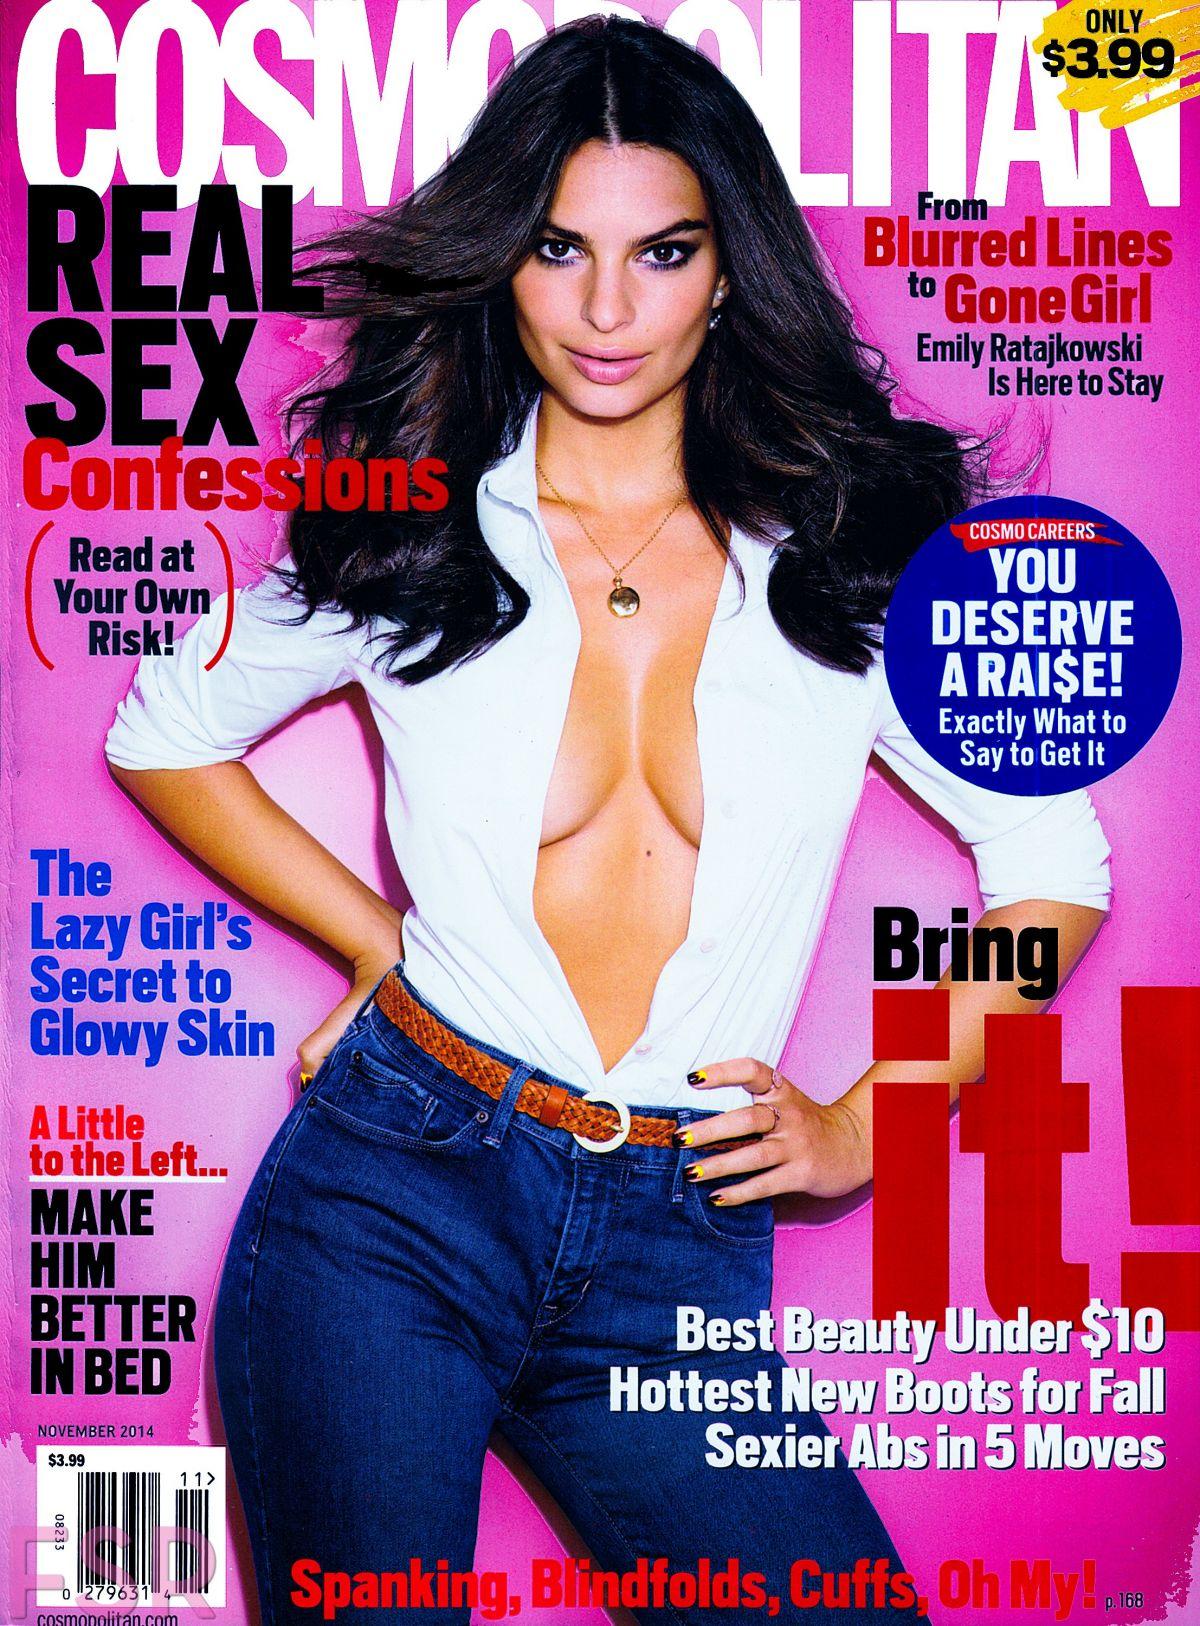 EMILY RATAJKOWSKI in Cosmopolitan Magazine, November 2014 Issue